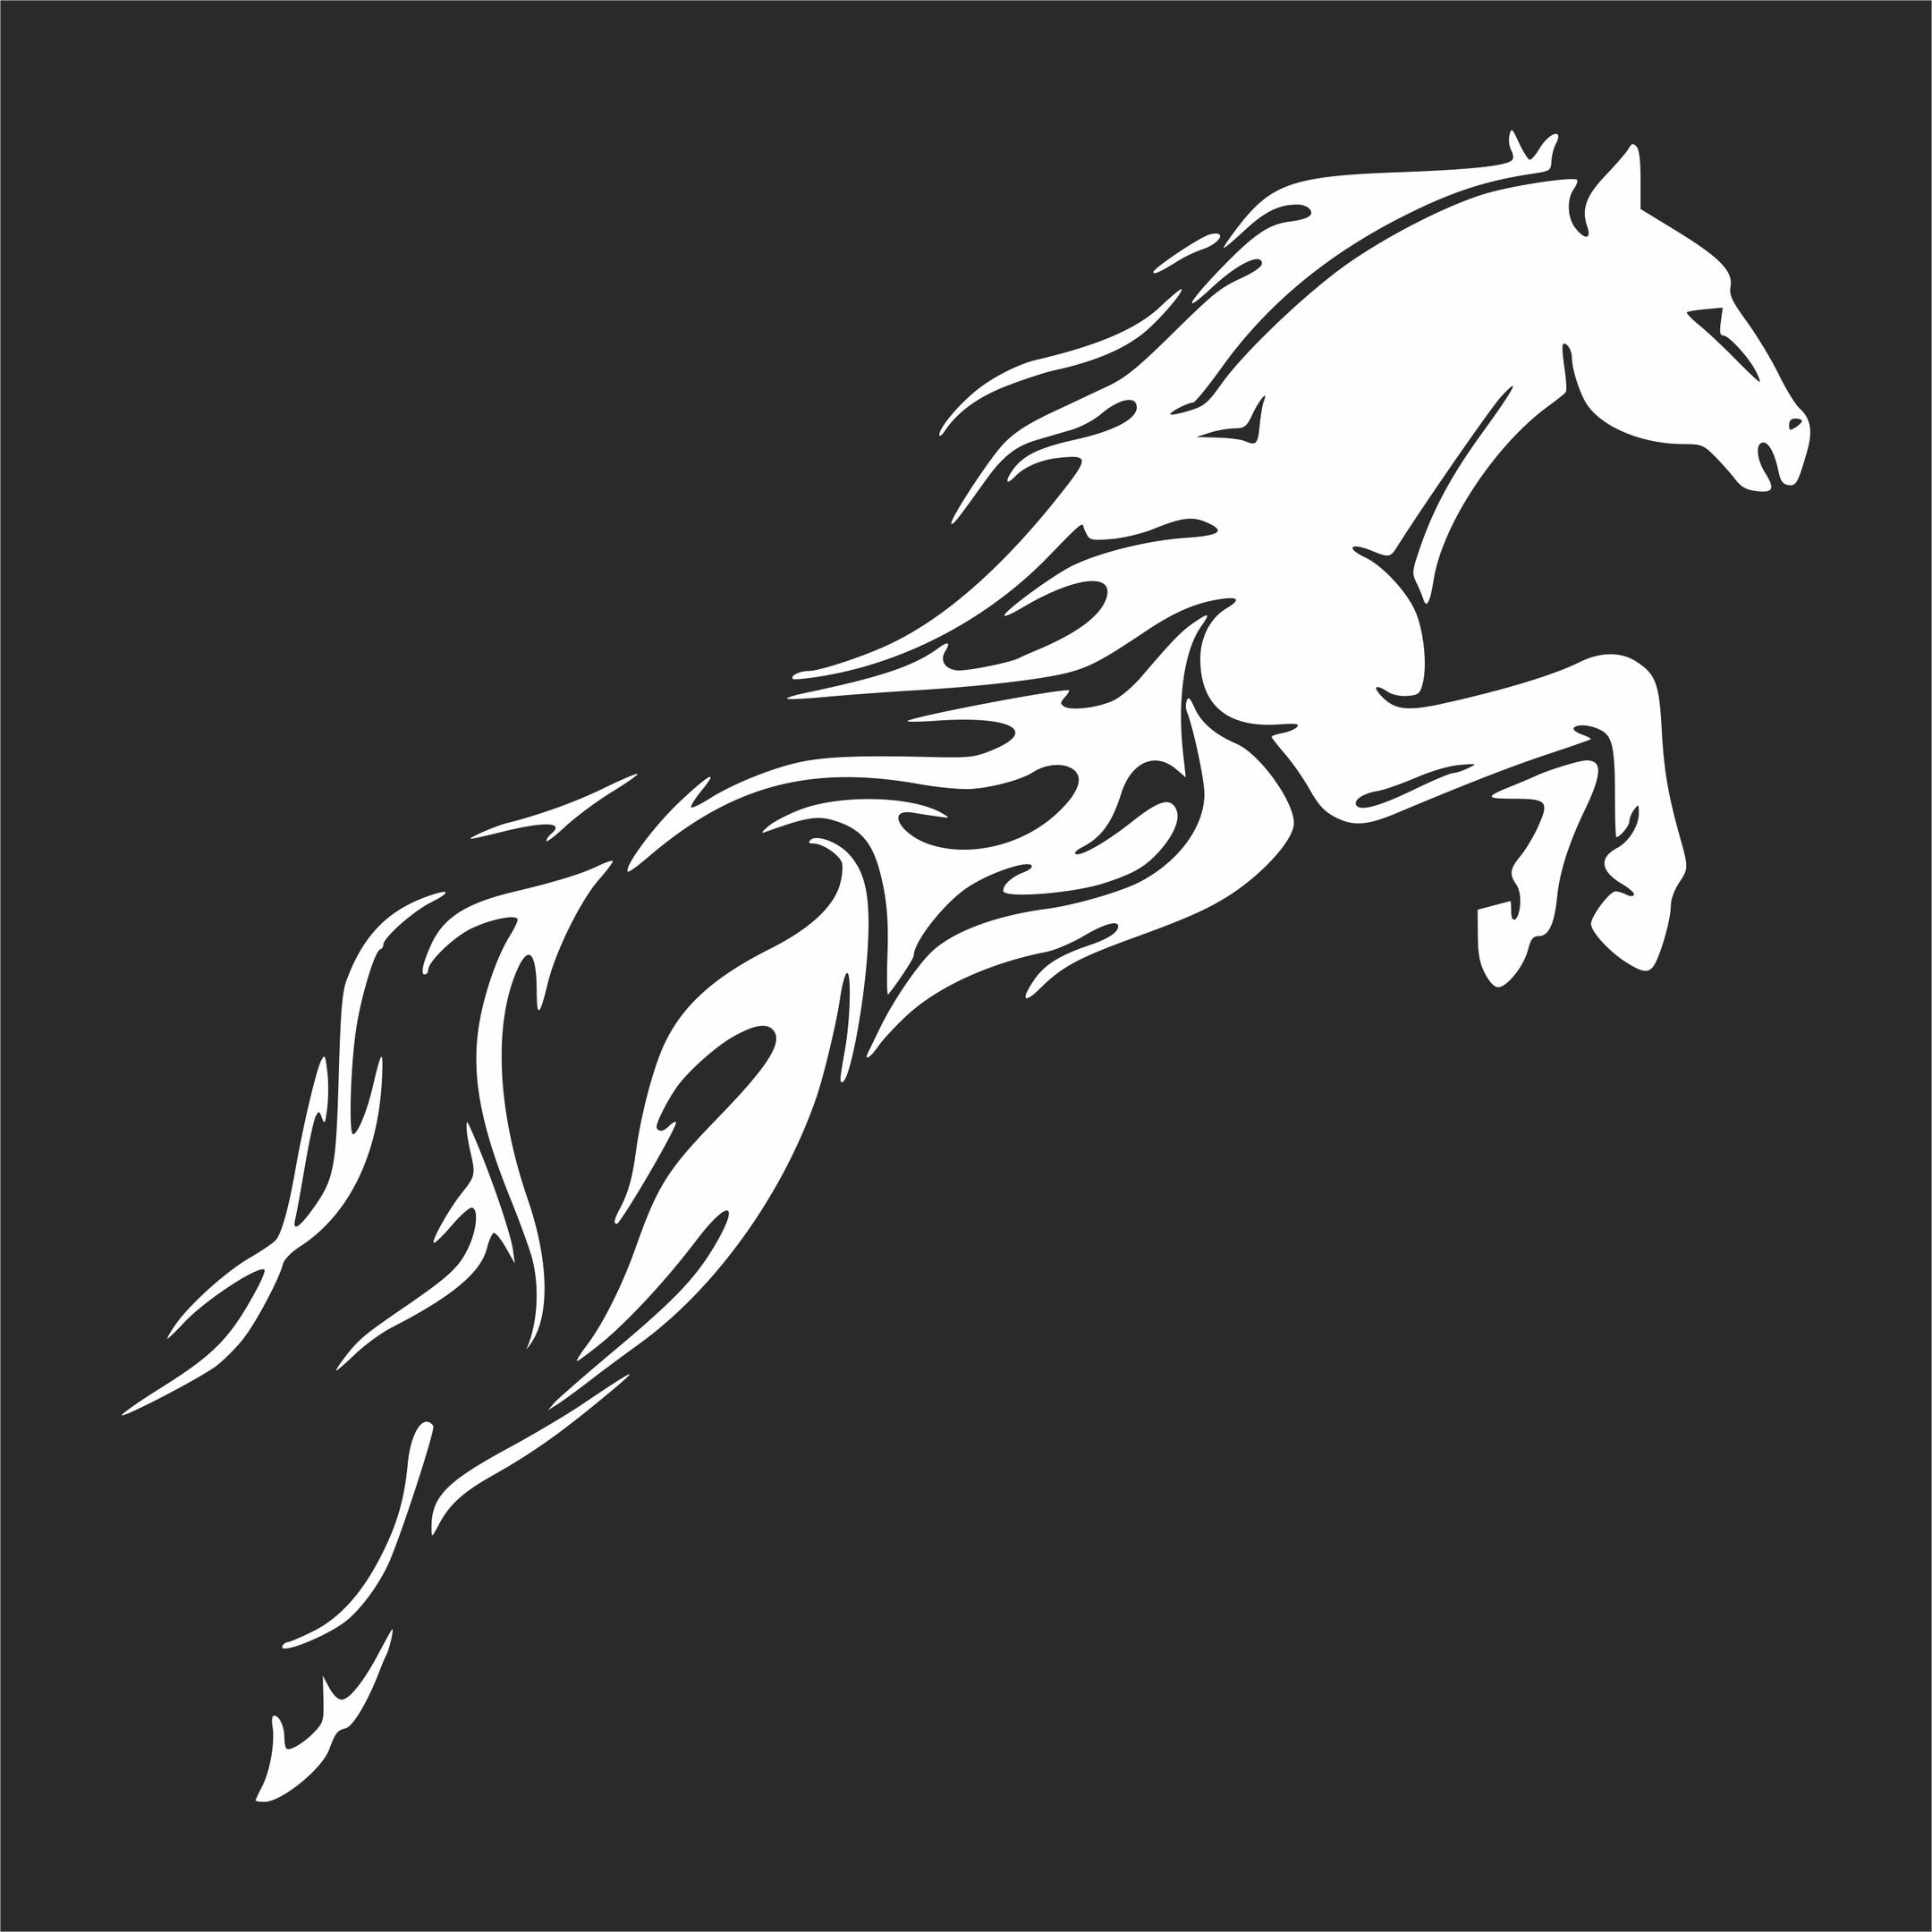 Tribal Horse * Plottdatei